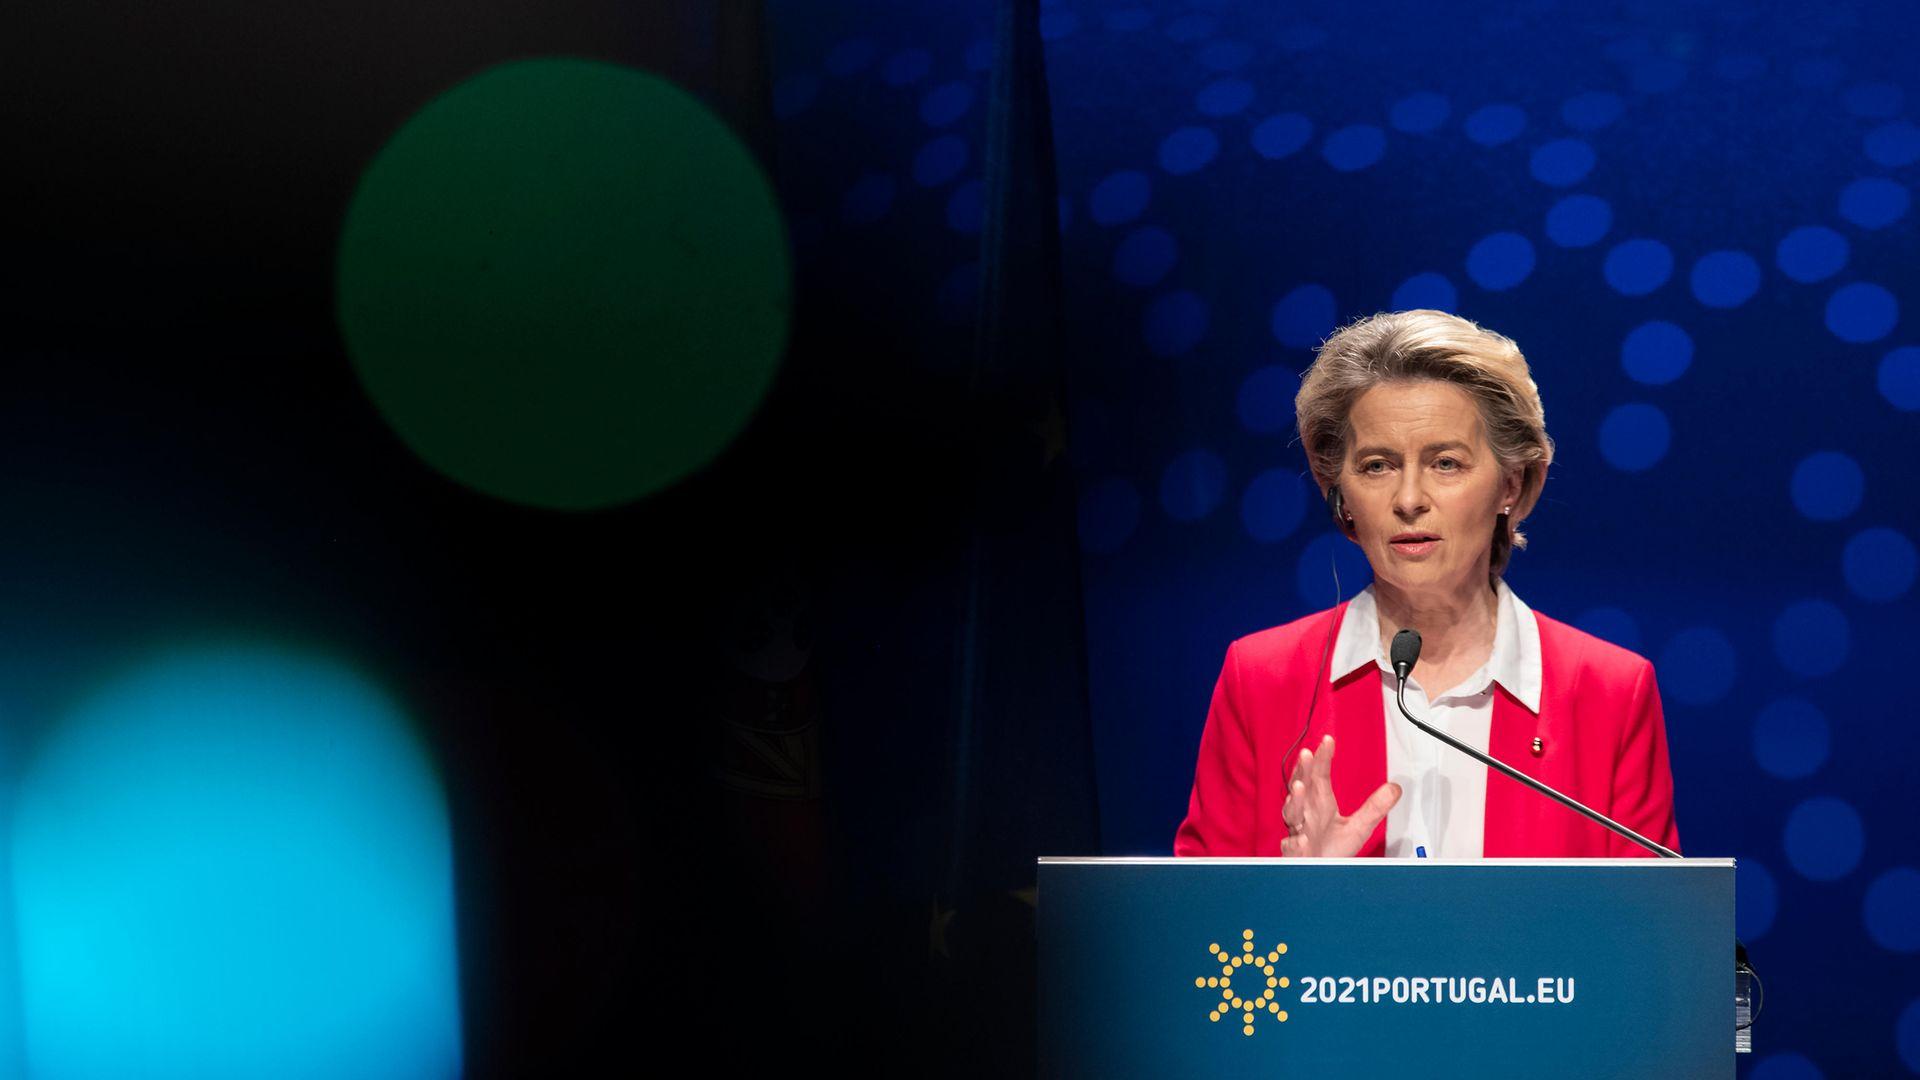 President of the European Commission, Ursula von der Leyen - Credit: SOPA Images/LightRocket via Gett